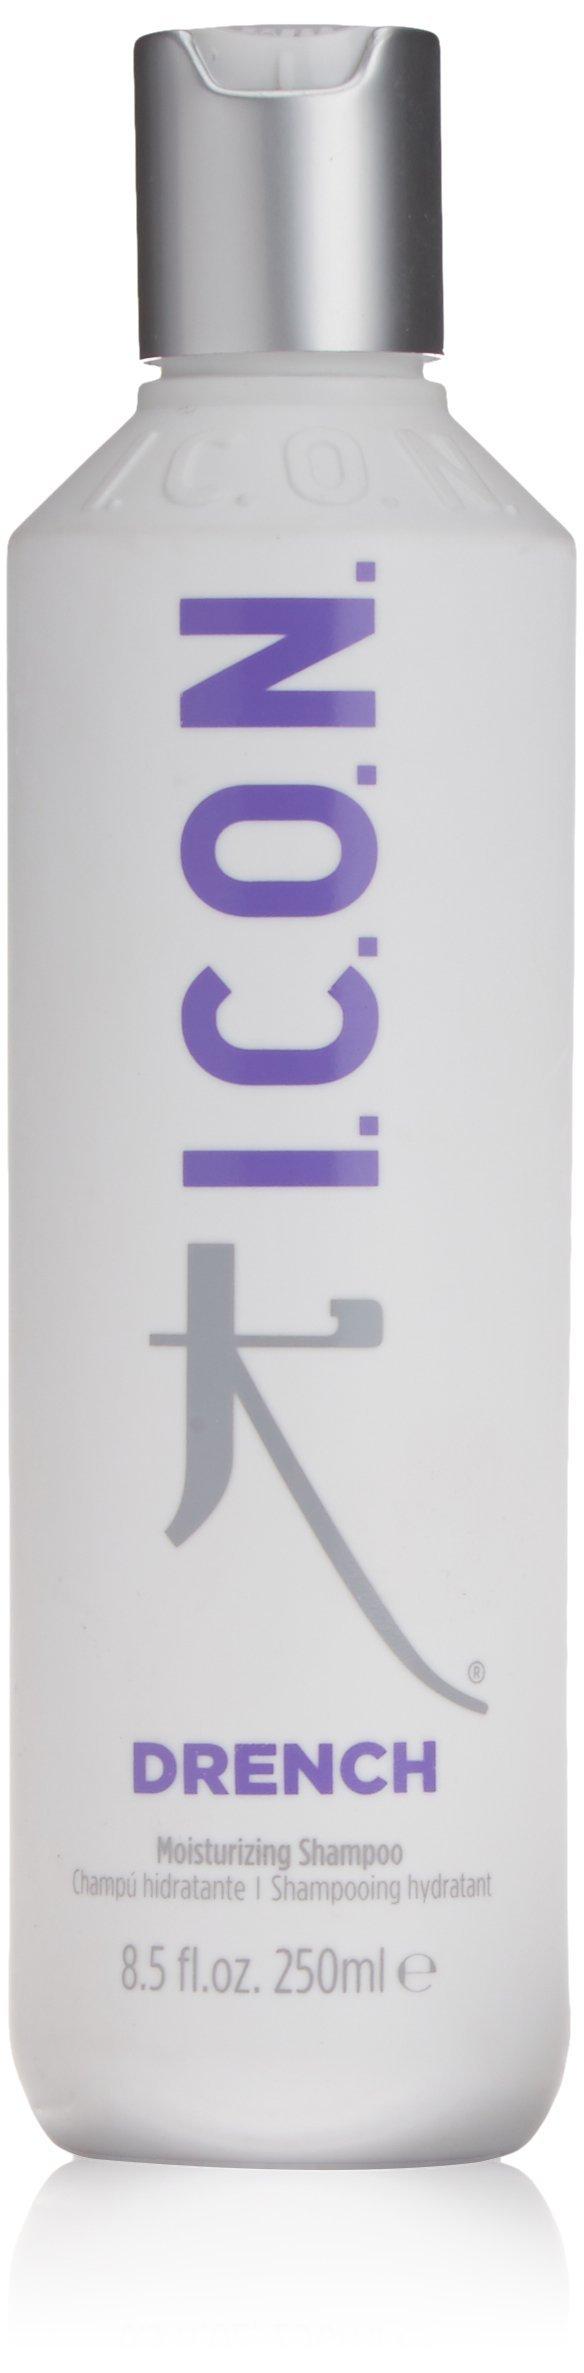 I.C.O.N. Drench Moisturizing Shampoo 8.5 oz.